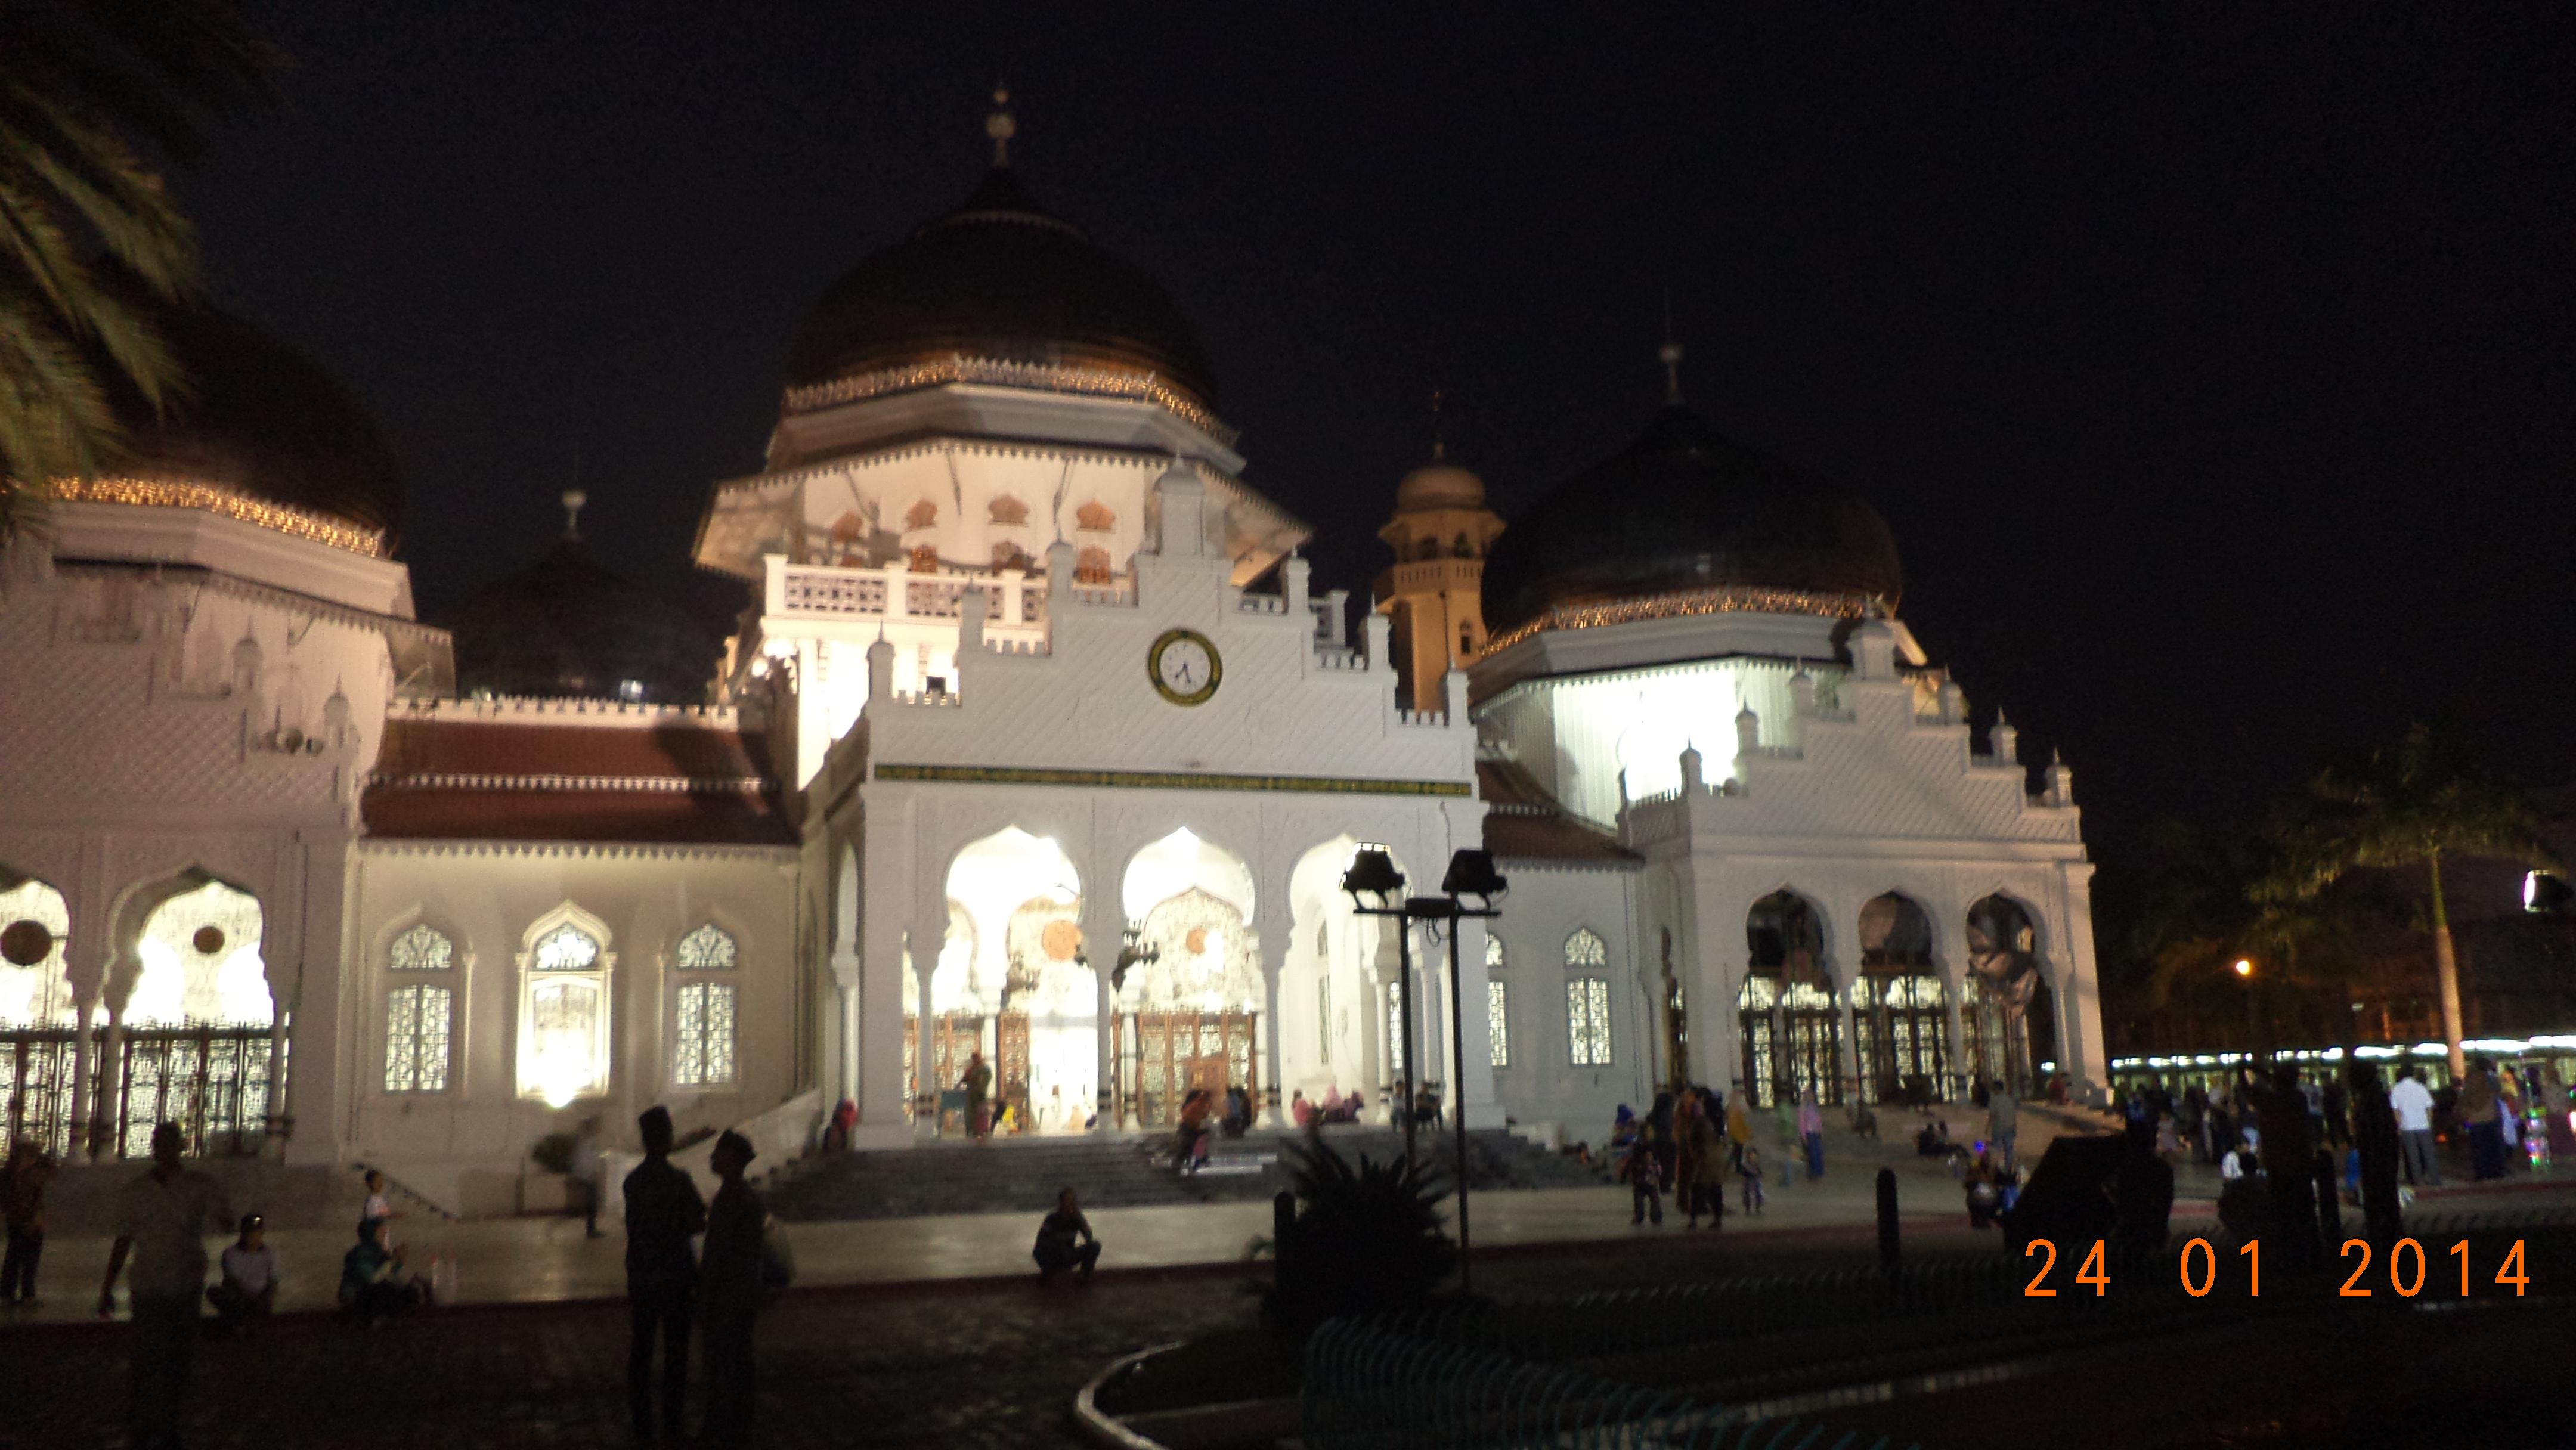 Pertamakali Banda Aceh Write Live Masjid Raya Baiturrahman Hasil Jepretan